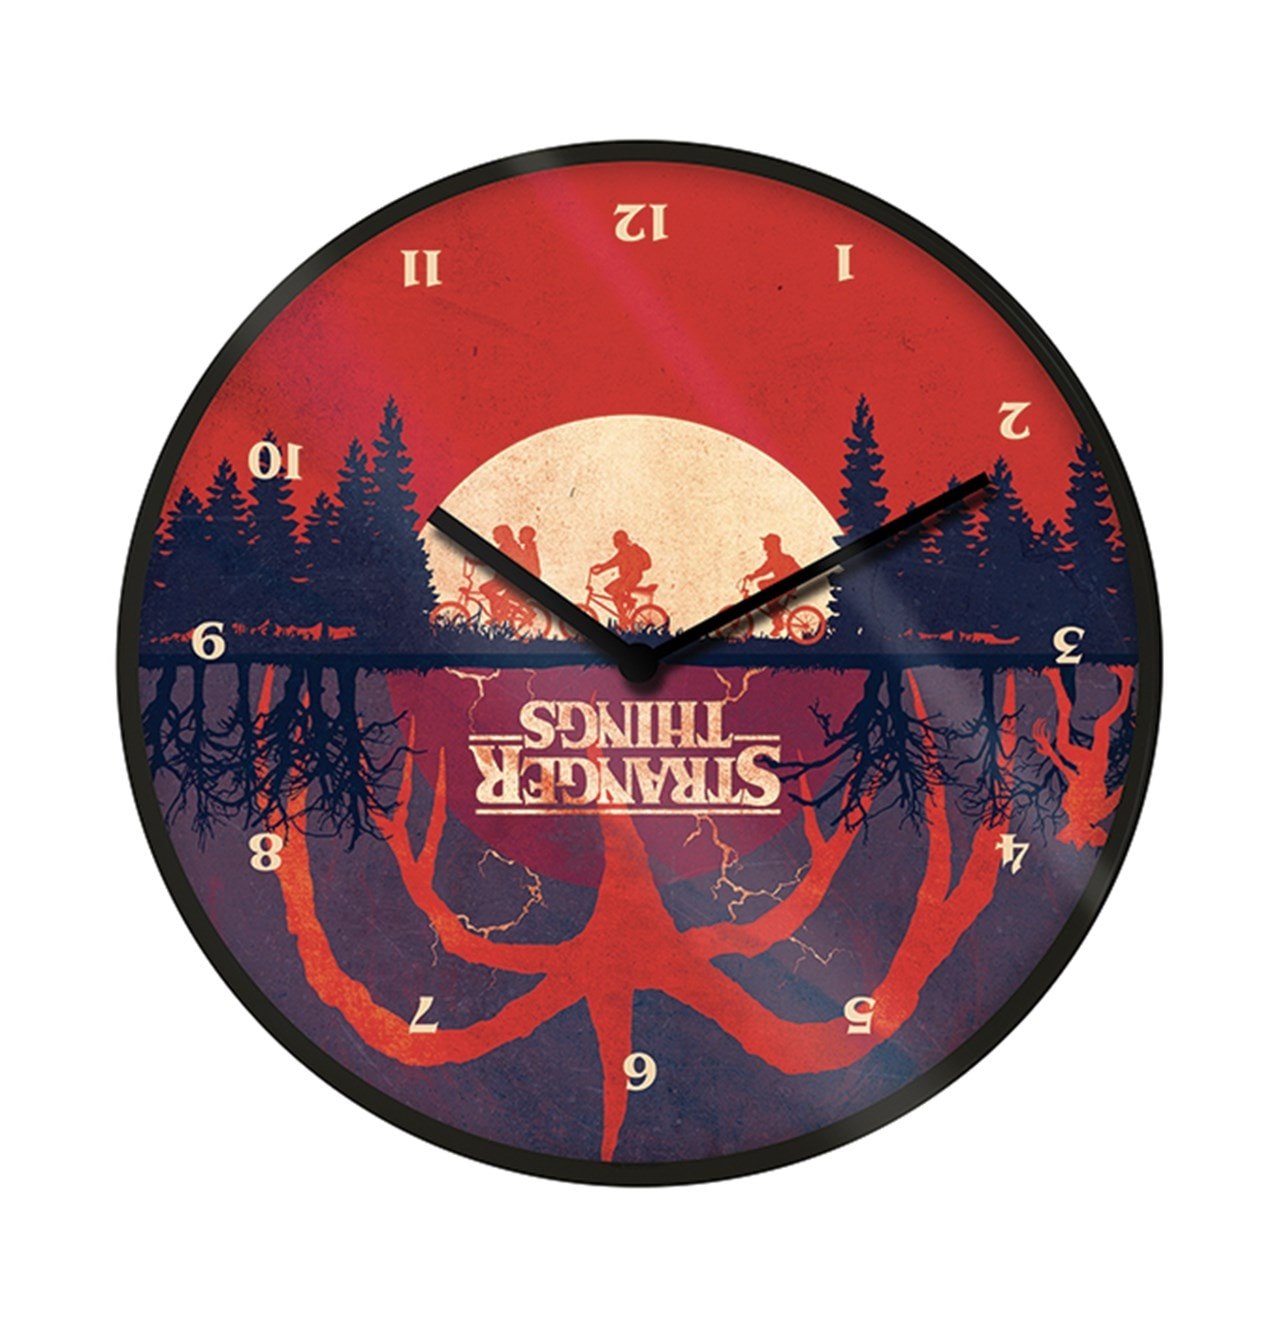 Upside Down: Stranger Things Clock - 1